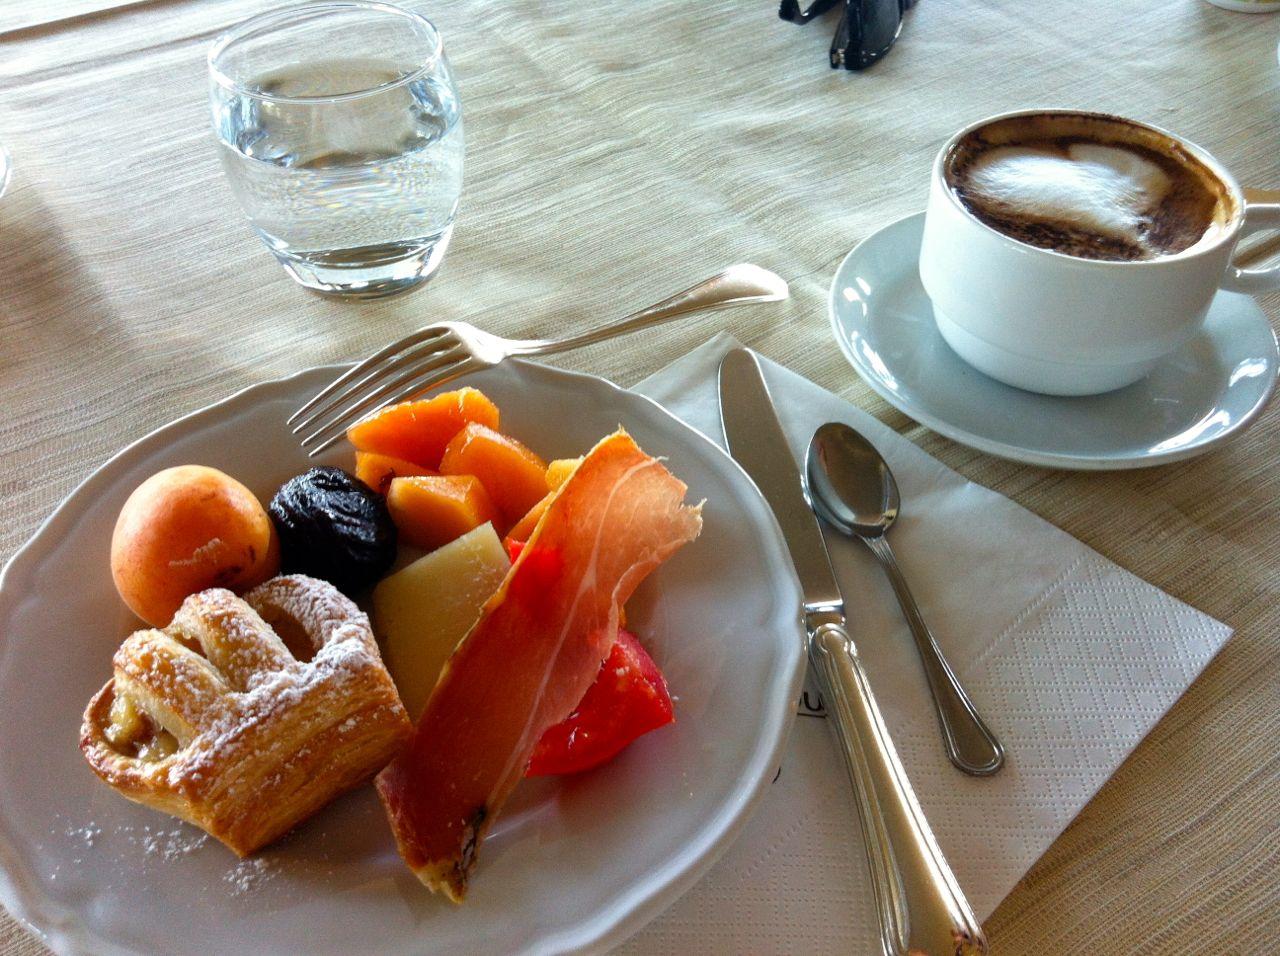 La vie intérieure: Breakfast in Italy